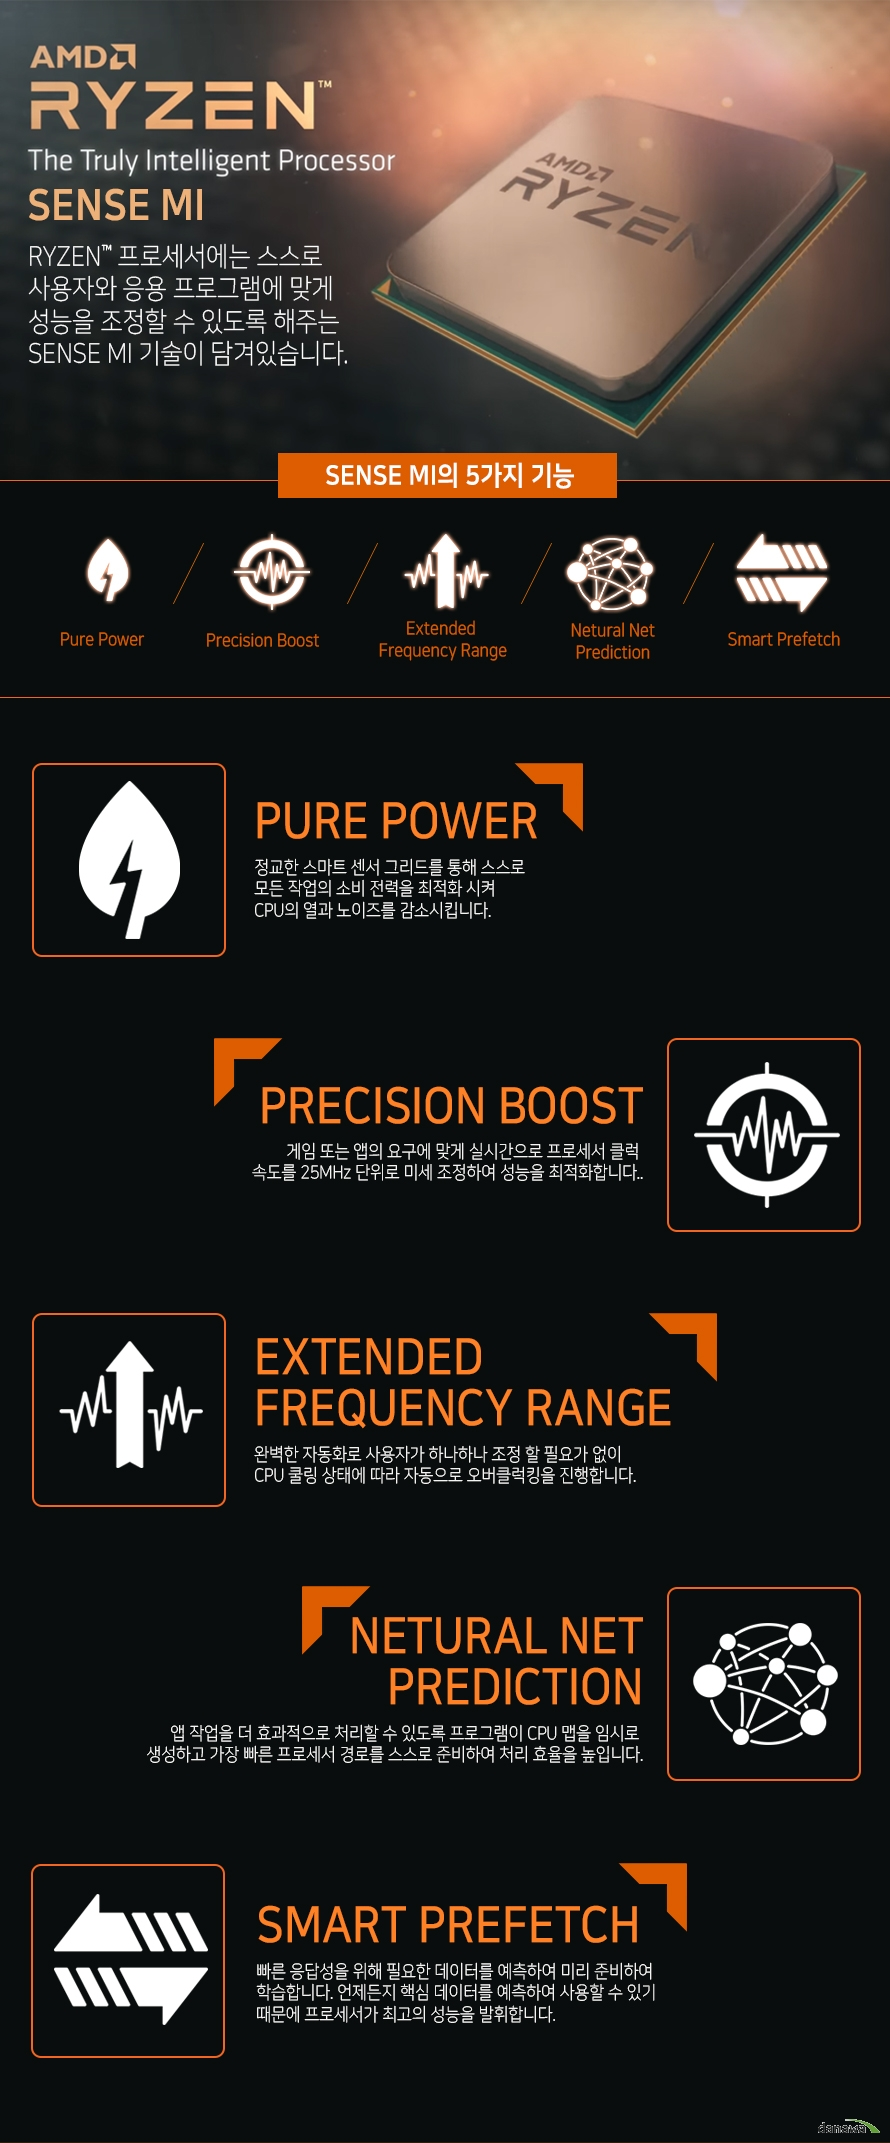 AMD RYZEN         THE TRULY INTELLIGENT PROCESSOR         SENSE MI                  RYZEN 프로세서에는 스스로 사용자와 응용 프로그램에 맞게         성능을 조정할 수 있도록 해주는 SENSE MI 기술이 담겨있습니다.             SENSE MI의 5가지 기능         PURE POWER         PRECISION BOOST         EXTENDED FREQUENCY RANGE         NETURAL NET PREDICTION         SMART PREFETCH                  PURE POWER         정교한 스마트 센서 그리드를 통해 스스로 모든 작업의 소비 전력을          최적화 시켜 CPU의 열과 노이즈를 감소시킵니다.                  PRECISION BOOST         게임 또는 앱의 요구에 맞게 실시간으로 프로세서 클럭 속도를 25MHZ         단위로 미세 조정하여 성능을 최적화 합니다.                  EXTENDED FREQUENCY RANGE         완벽한 자동화로 사용자가 하나하나 조정할 필요가 없이          CPU쿨링 상태에 따라 자동으로 오버클럭킹을 진행합니다.                  NETURAL NET PREDICTION         앱 작업을 더 효과적으로 처리할 수 있도록 프로그램이 CPU 맵을 임시로         생성하고 가장 빠른 프로세서 경로를 스스로 준비하여 처리 효율을 높입니다.                  SMART PREFETCH         빠른 응답성을 위해 필요한 데이터를 예측하여 미리 준비하여 학습합니다.         언제든지 핵심 데이터를 예측하여 사용할 수 있기 때문에 프로세서가         최고의 성능을 발휘합니다.